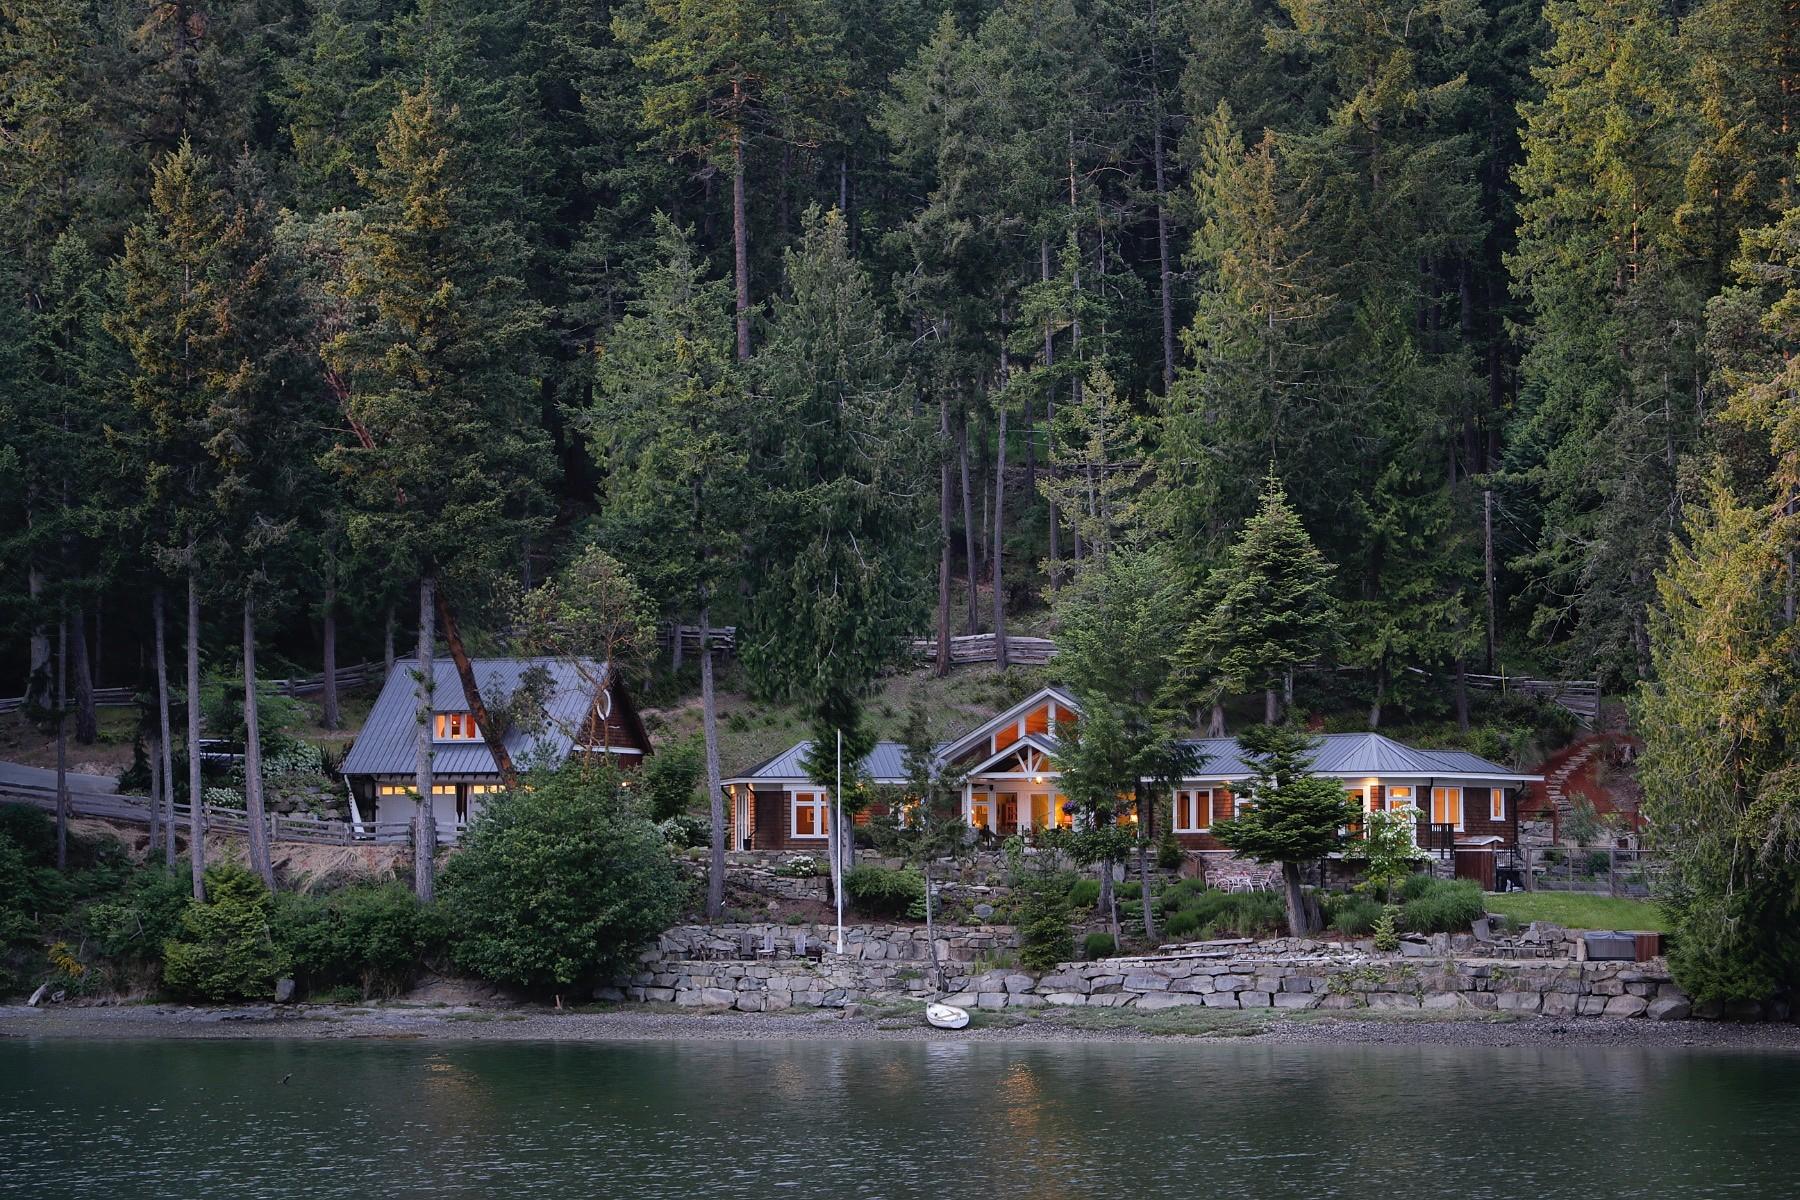 獨棟家庭住宅 為 出售 在 Elegance on the Ocean 711 Mansell Road, Salt Spring Island, 不列顛哥倫比亞省, V8K 1R5 加拿大